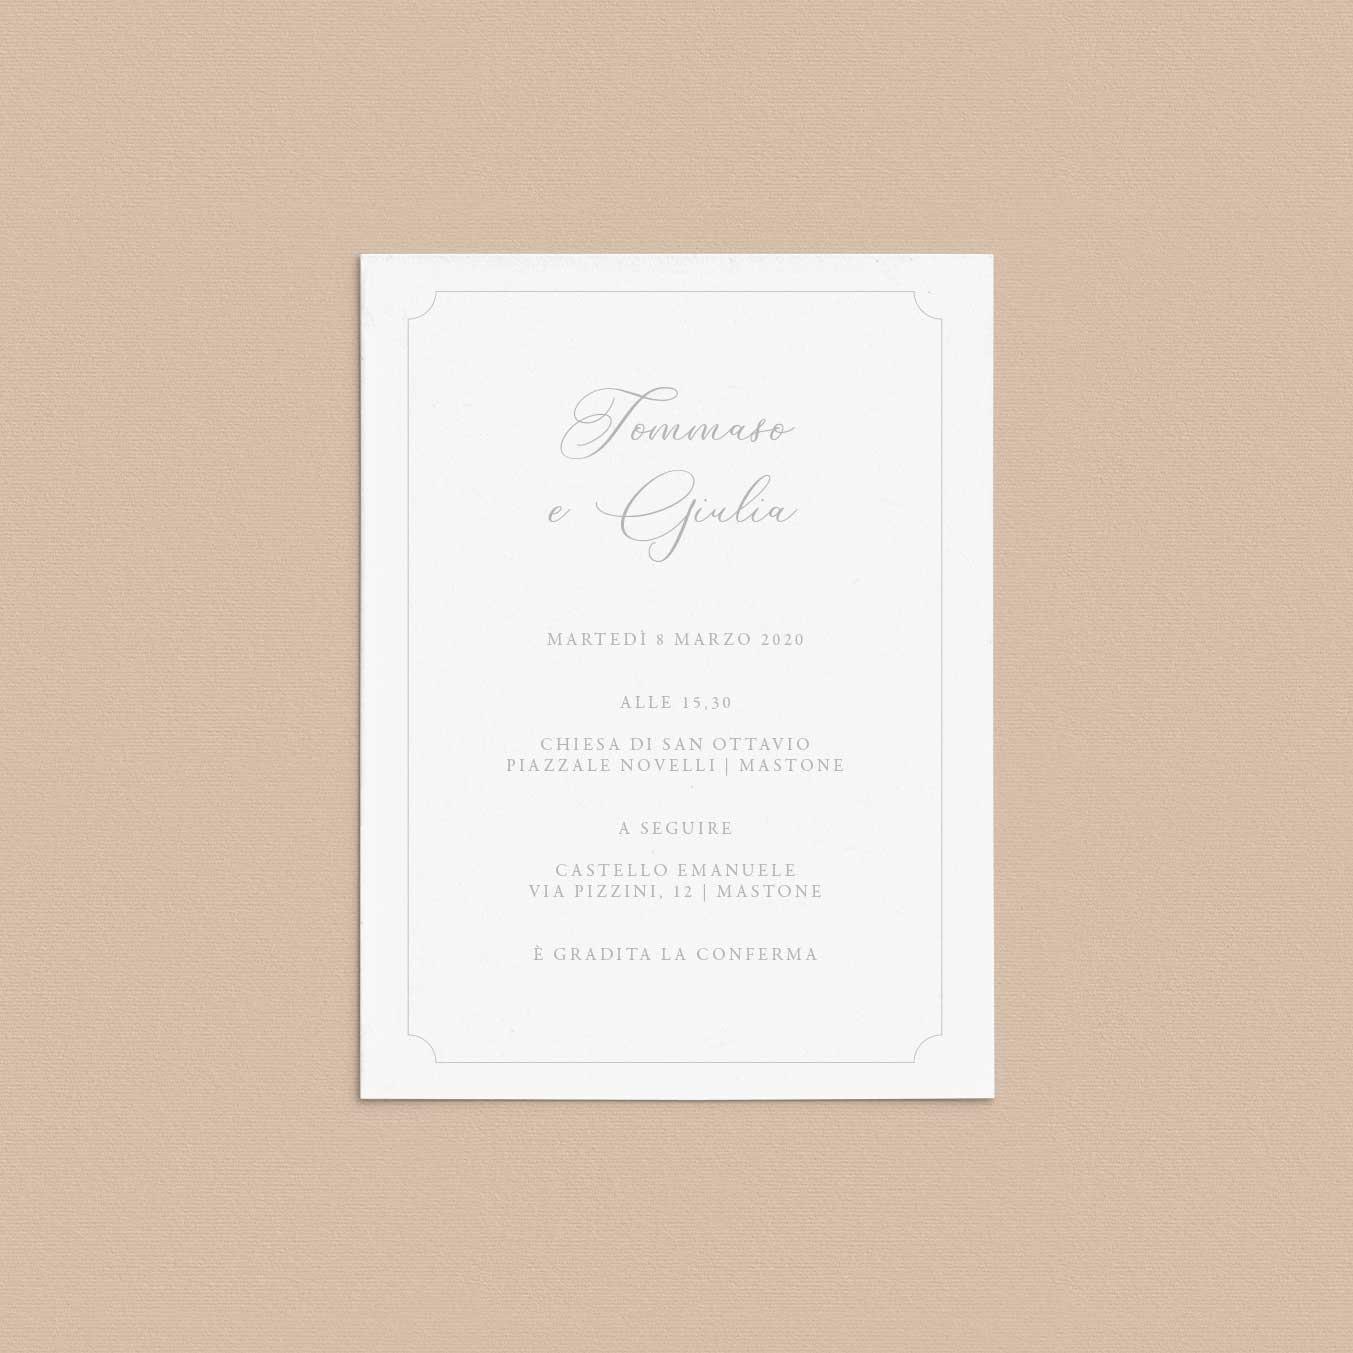 Partecipazioni-inviti-eleganti-matrimonio-2020-elegante-raffinato-monogramma-classico-classic